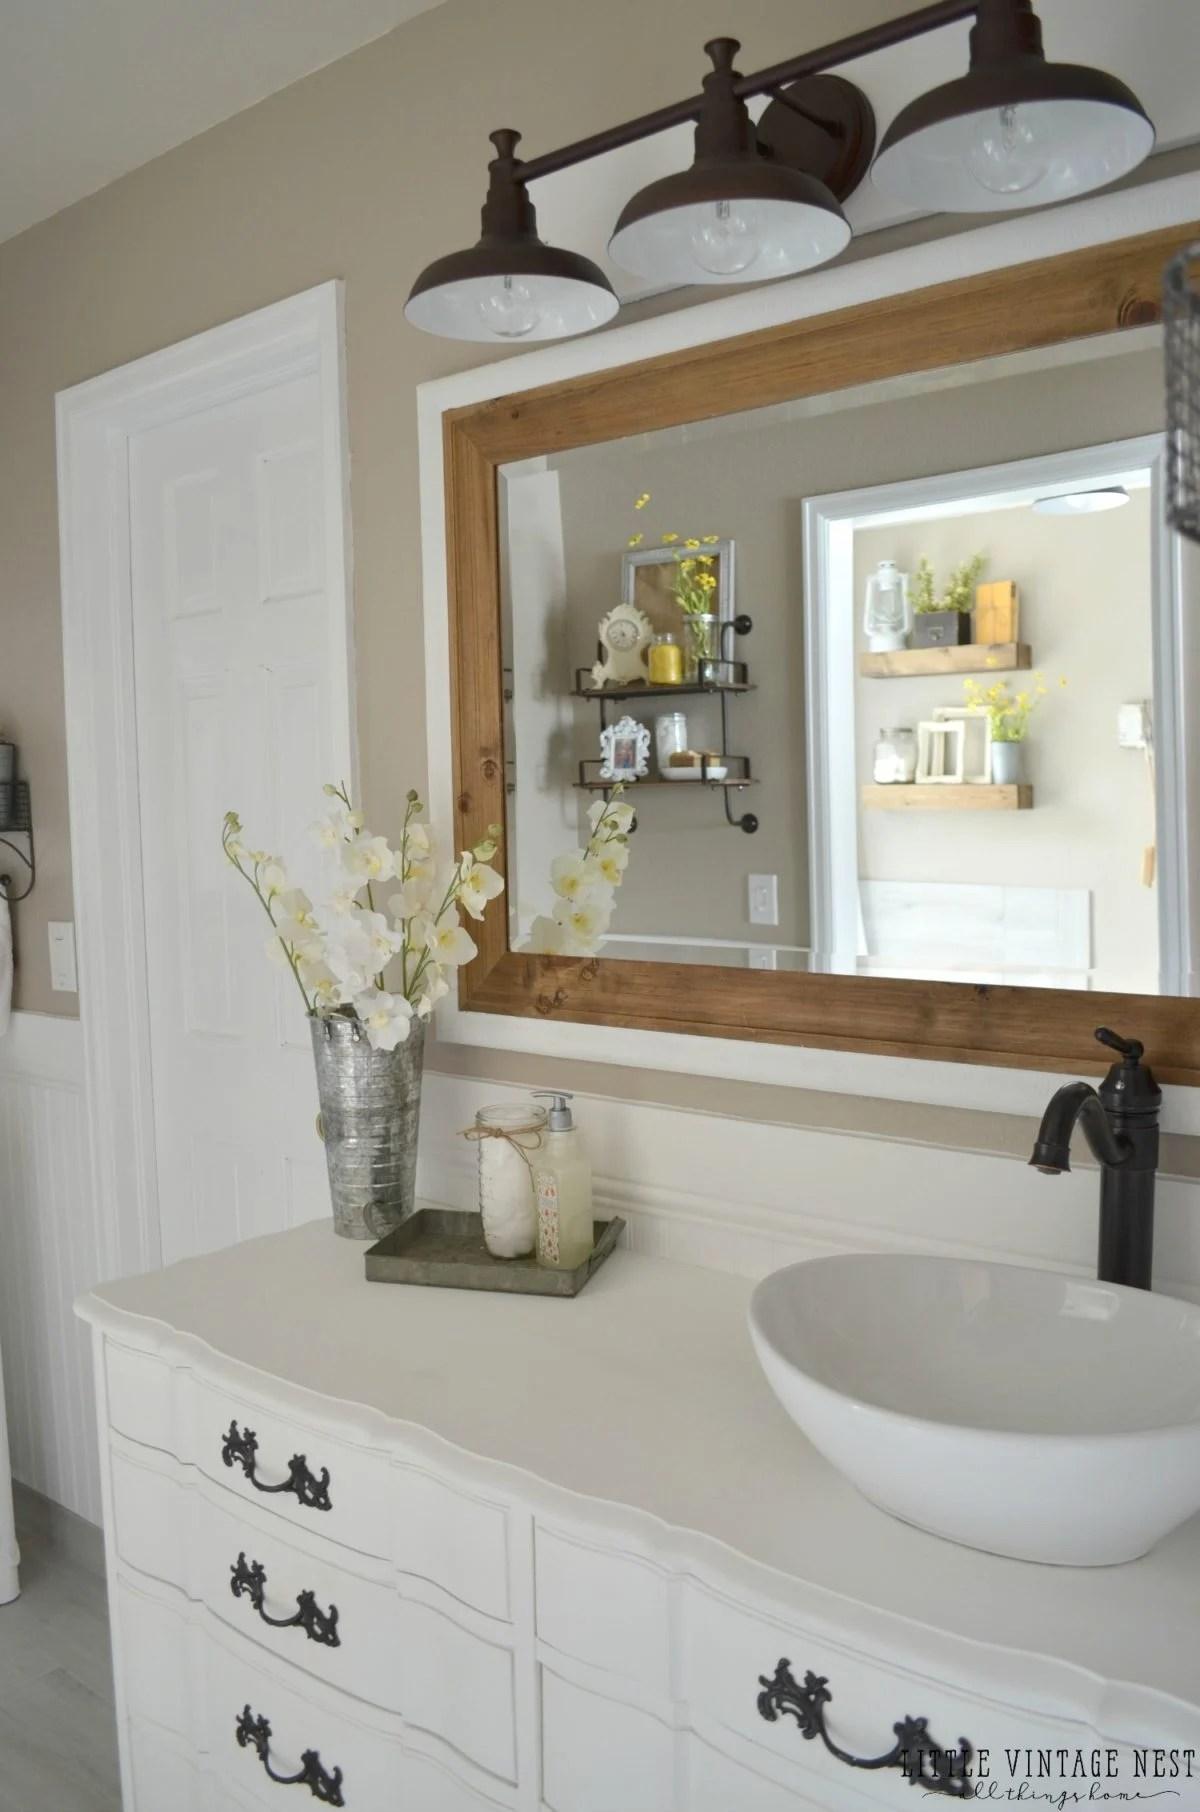 Farmhouse Master Bathroom Reveal  Little Vintage Nest